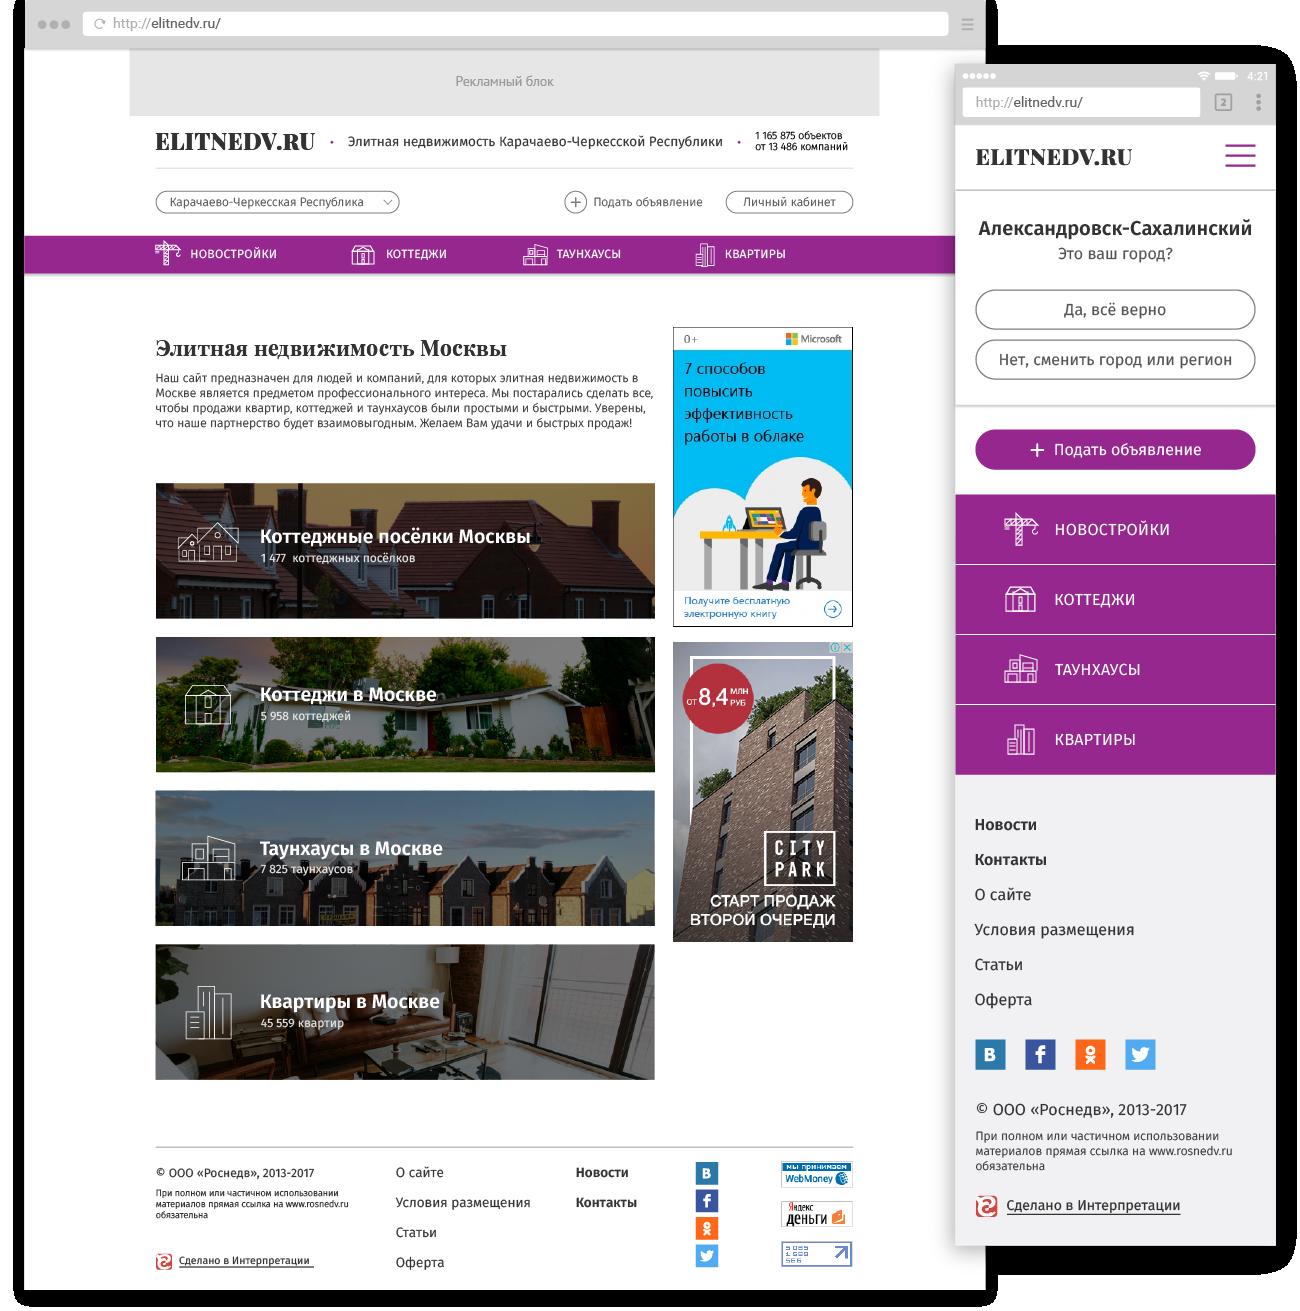 Главная страница сервиса elitnedv.ru.